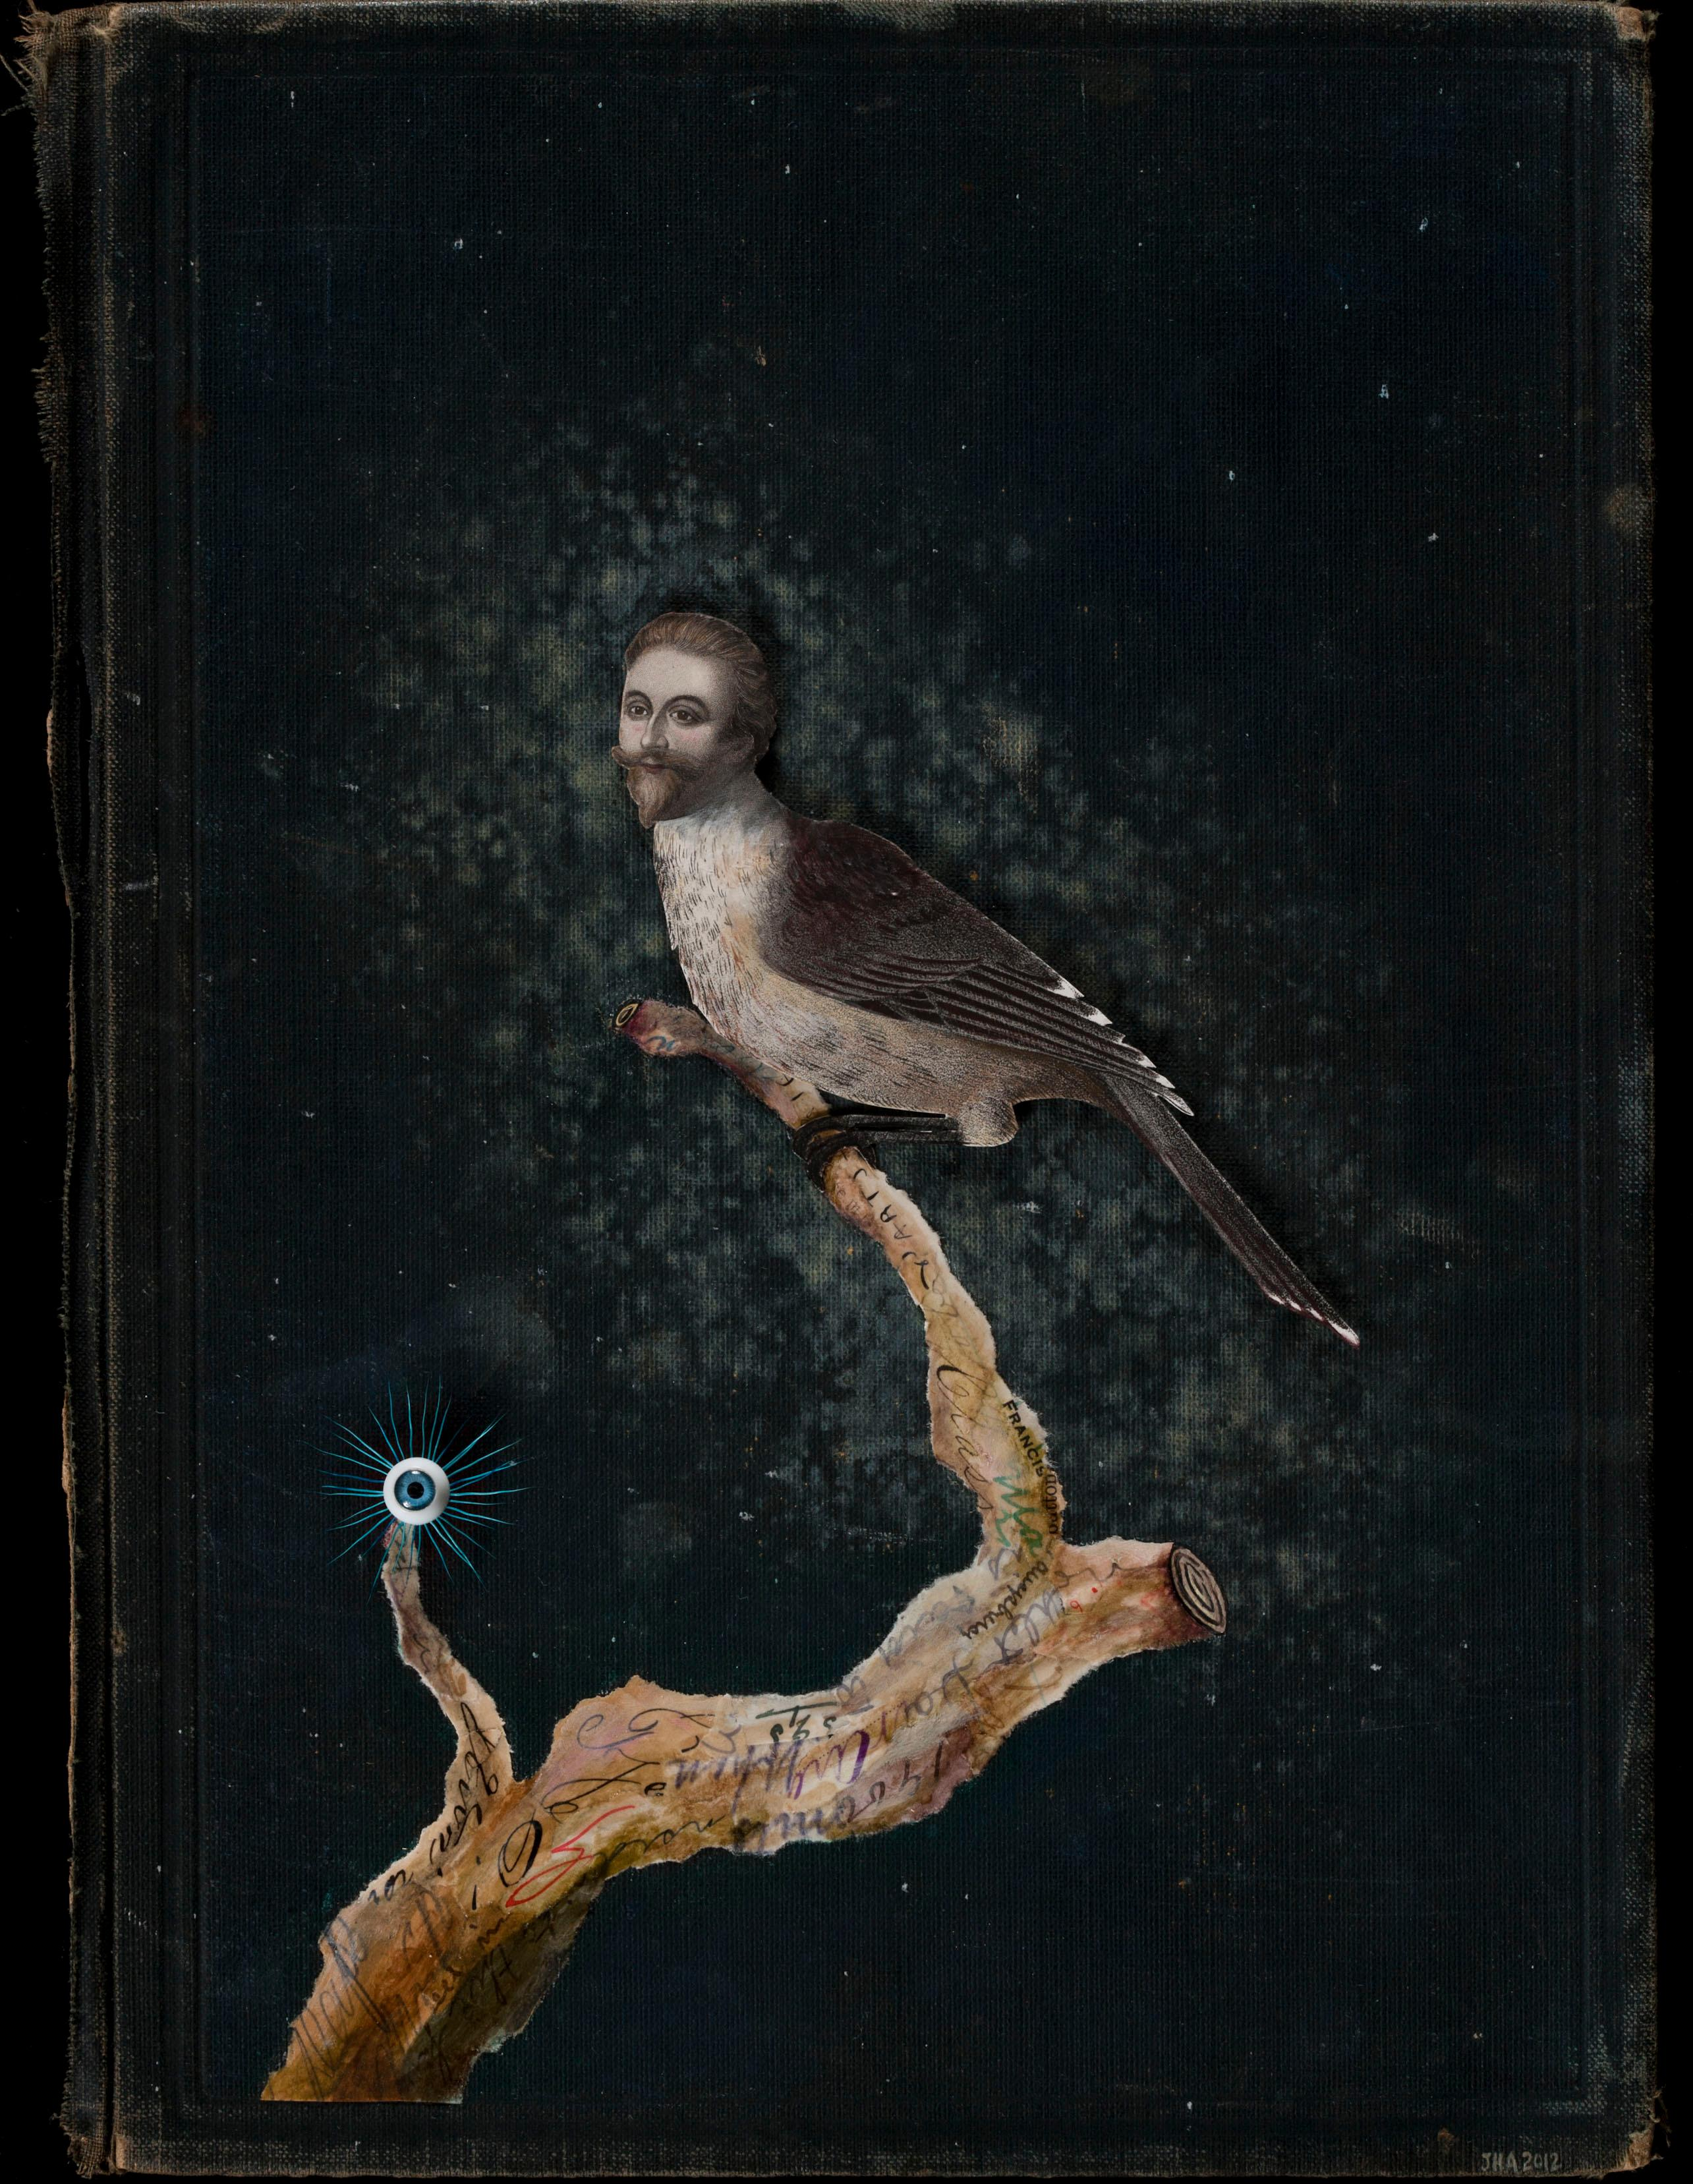 Book Cover No. 115